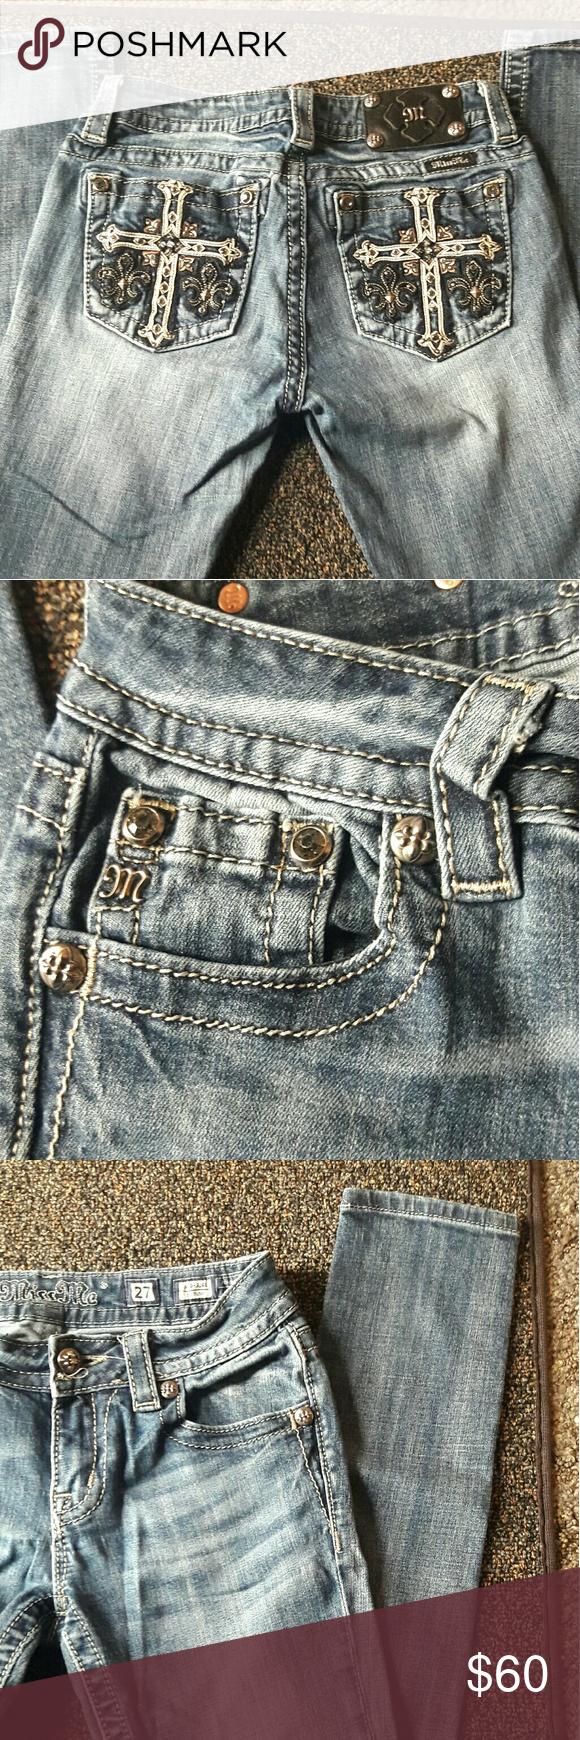 Miss Me designer jeans ! Popular Miss Me designer jeans, size 27 (size 8) Skinny, mid rise. Well taken care of, Make an offer! Miss Me Jeans Skinny